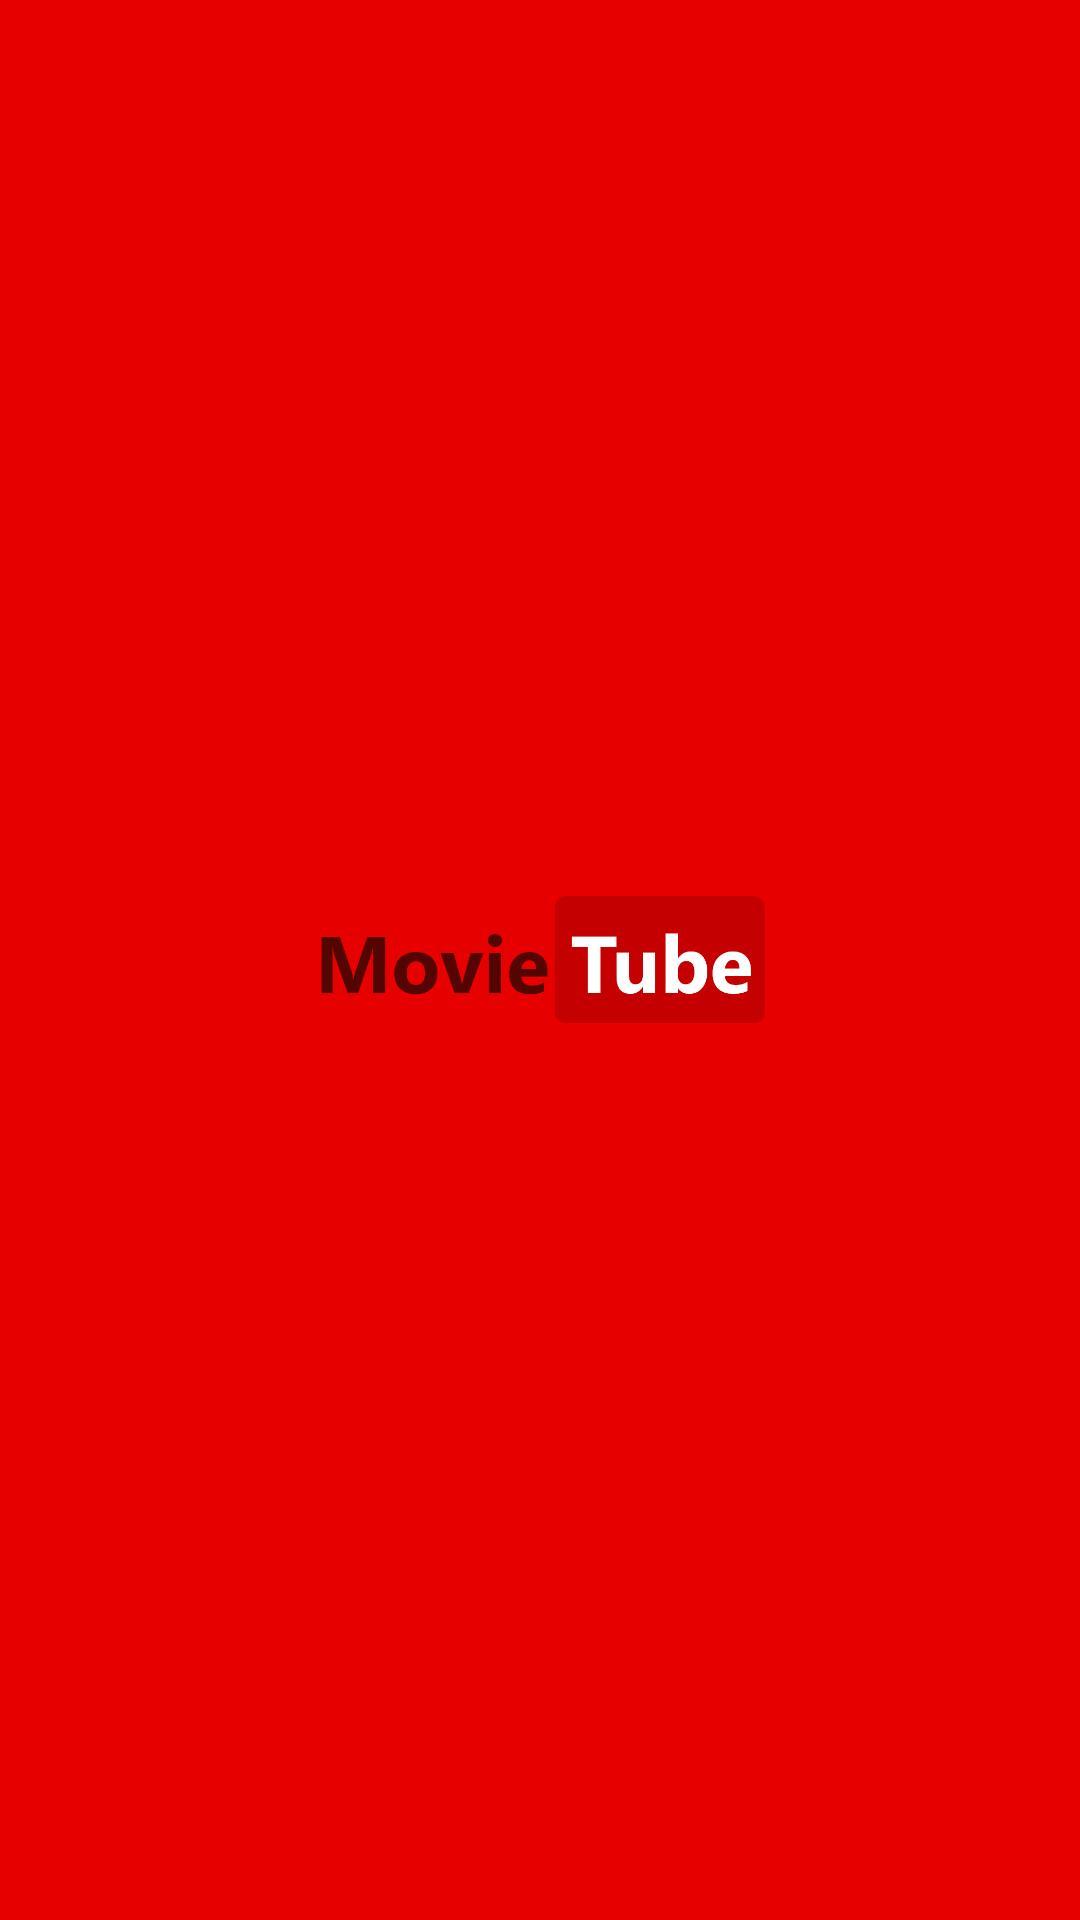 movietube apk 4.2 download